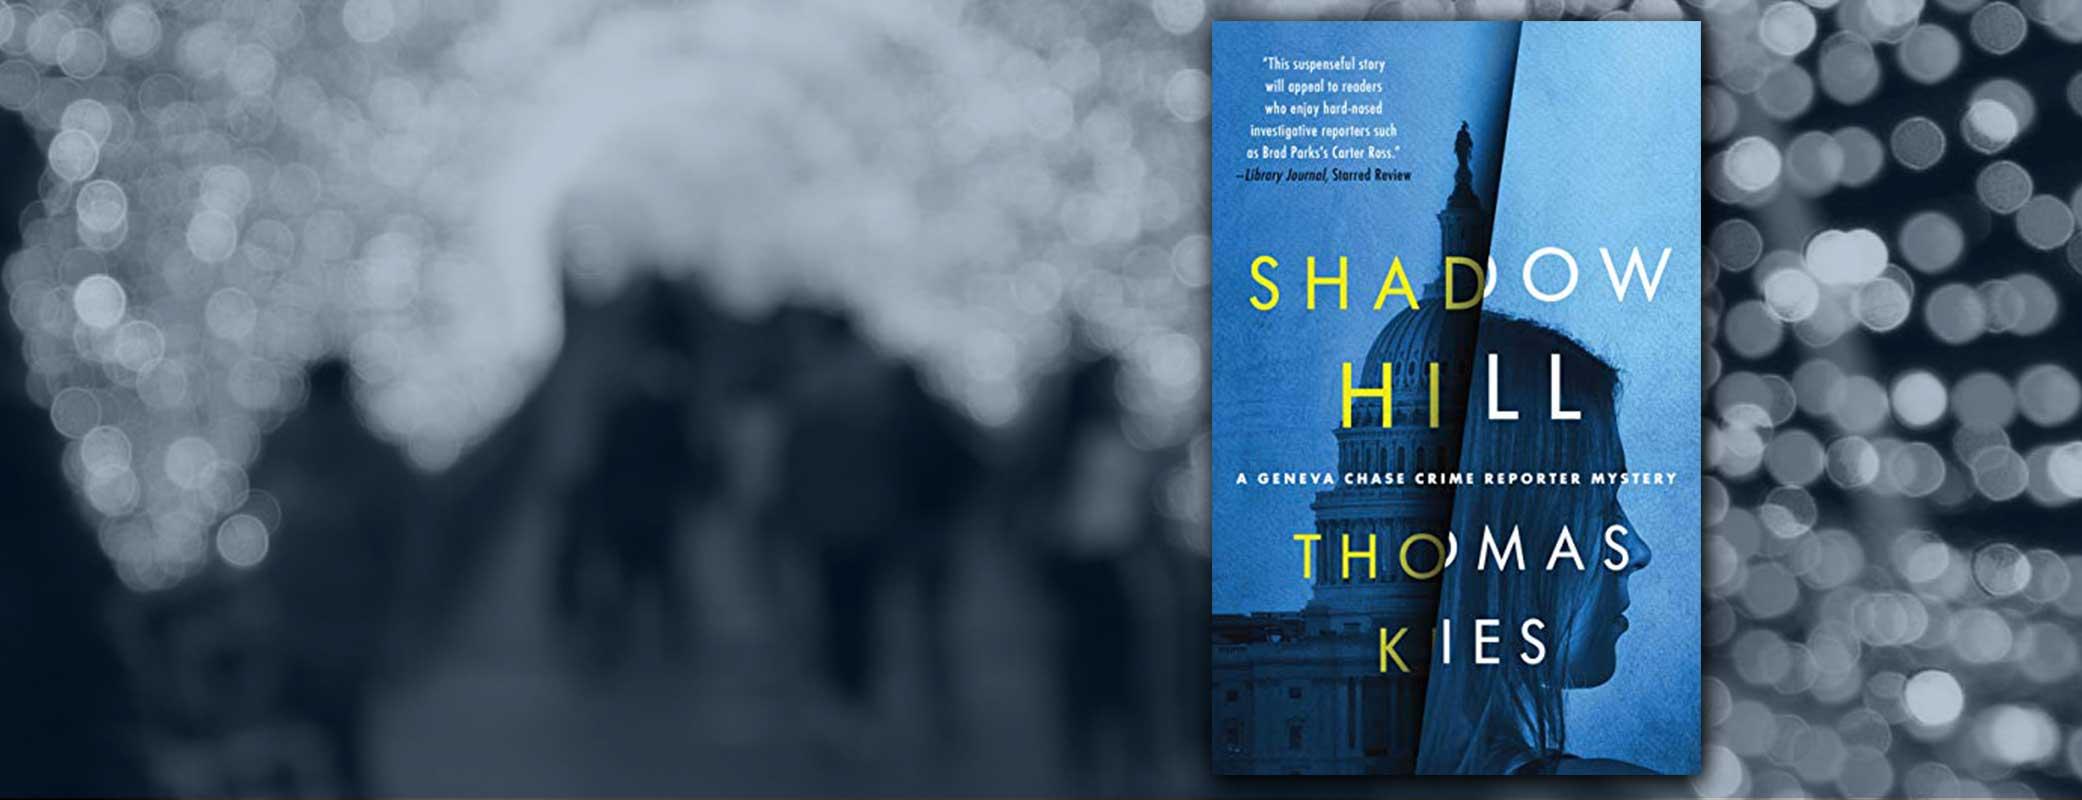 Cover of Shadow Hill novel by Thomas Kies